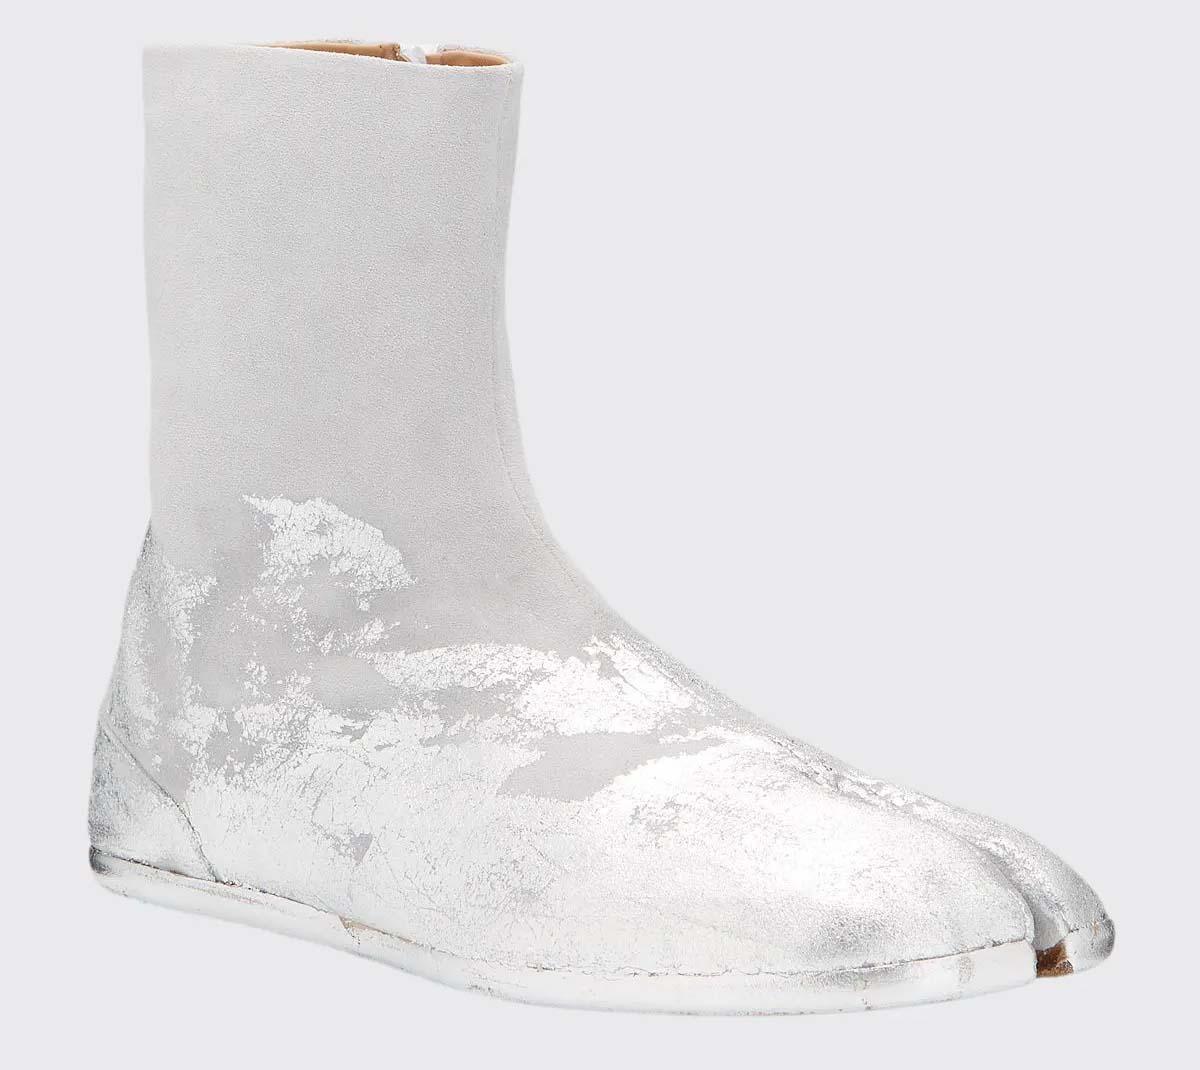 Maison Margiela Suede Tank Tabi Boots Metallic Paint